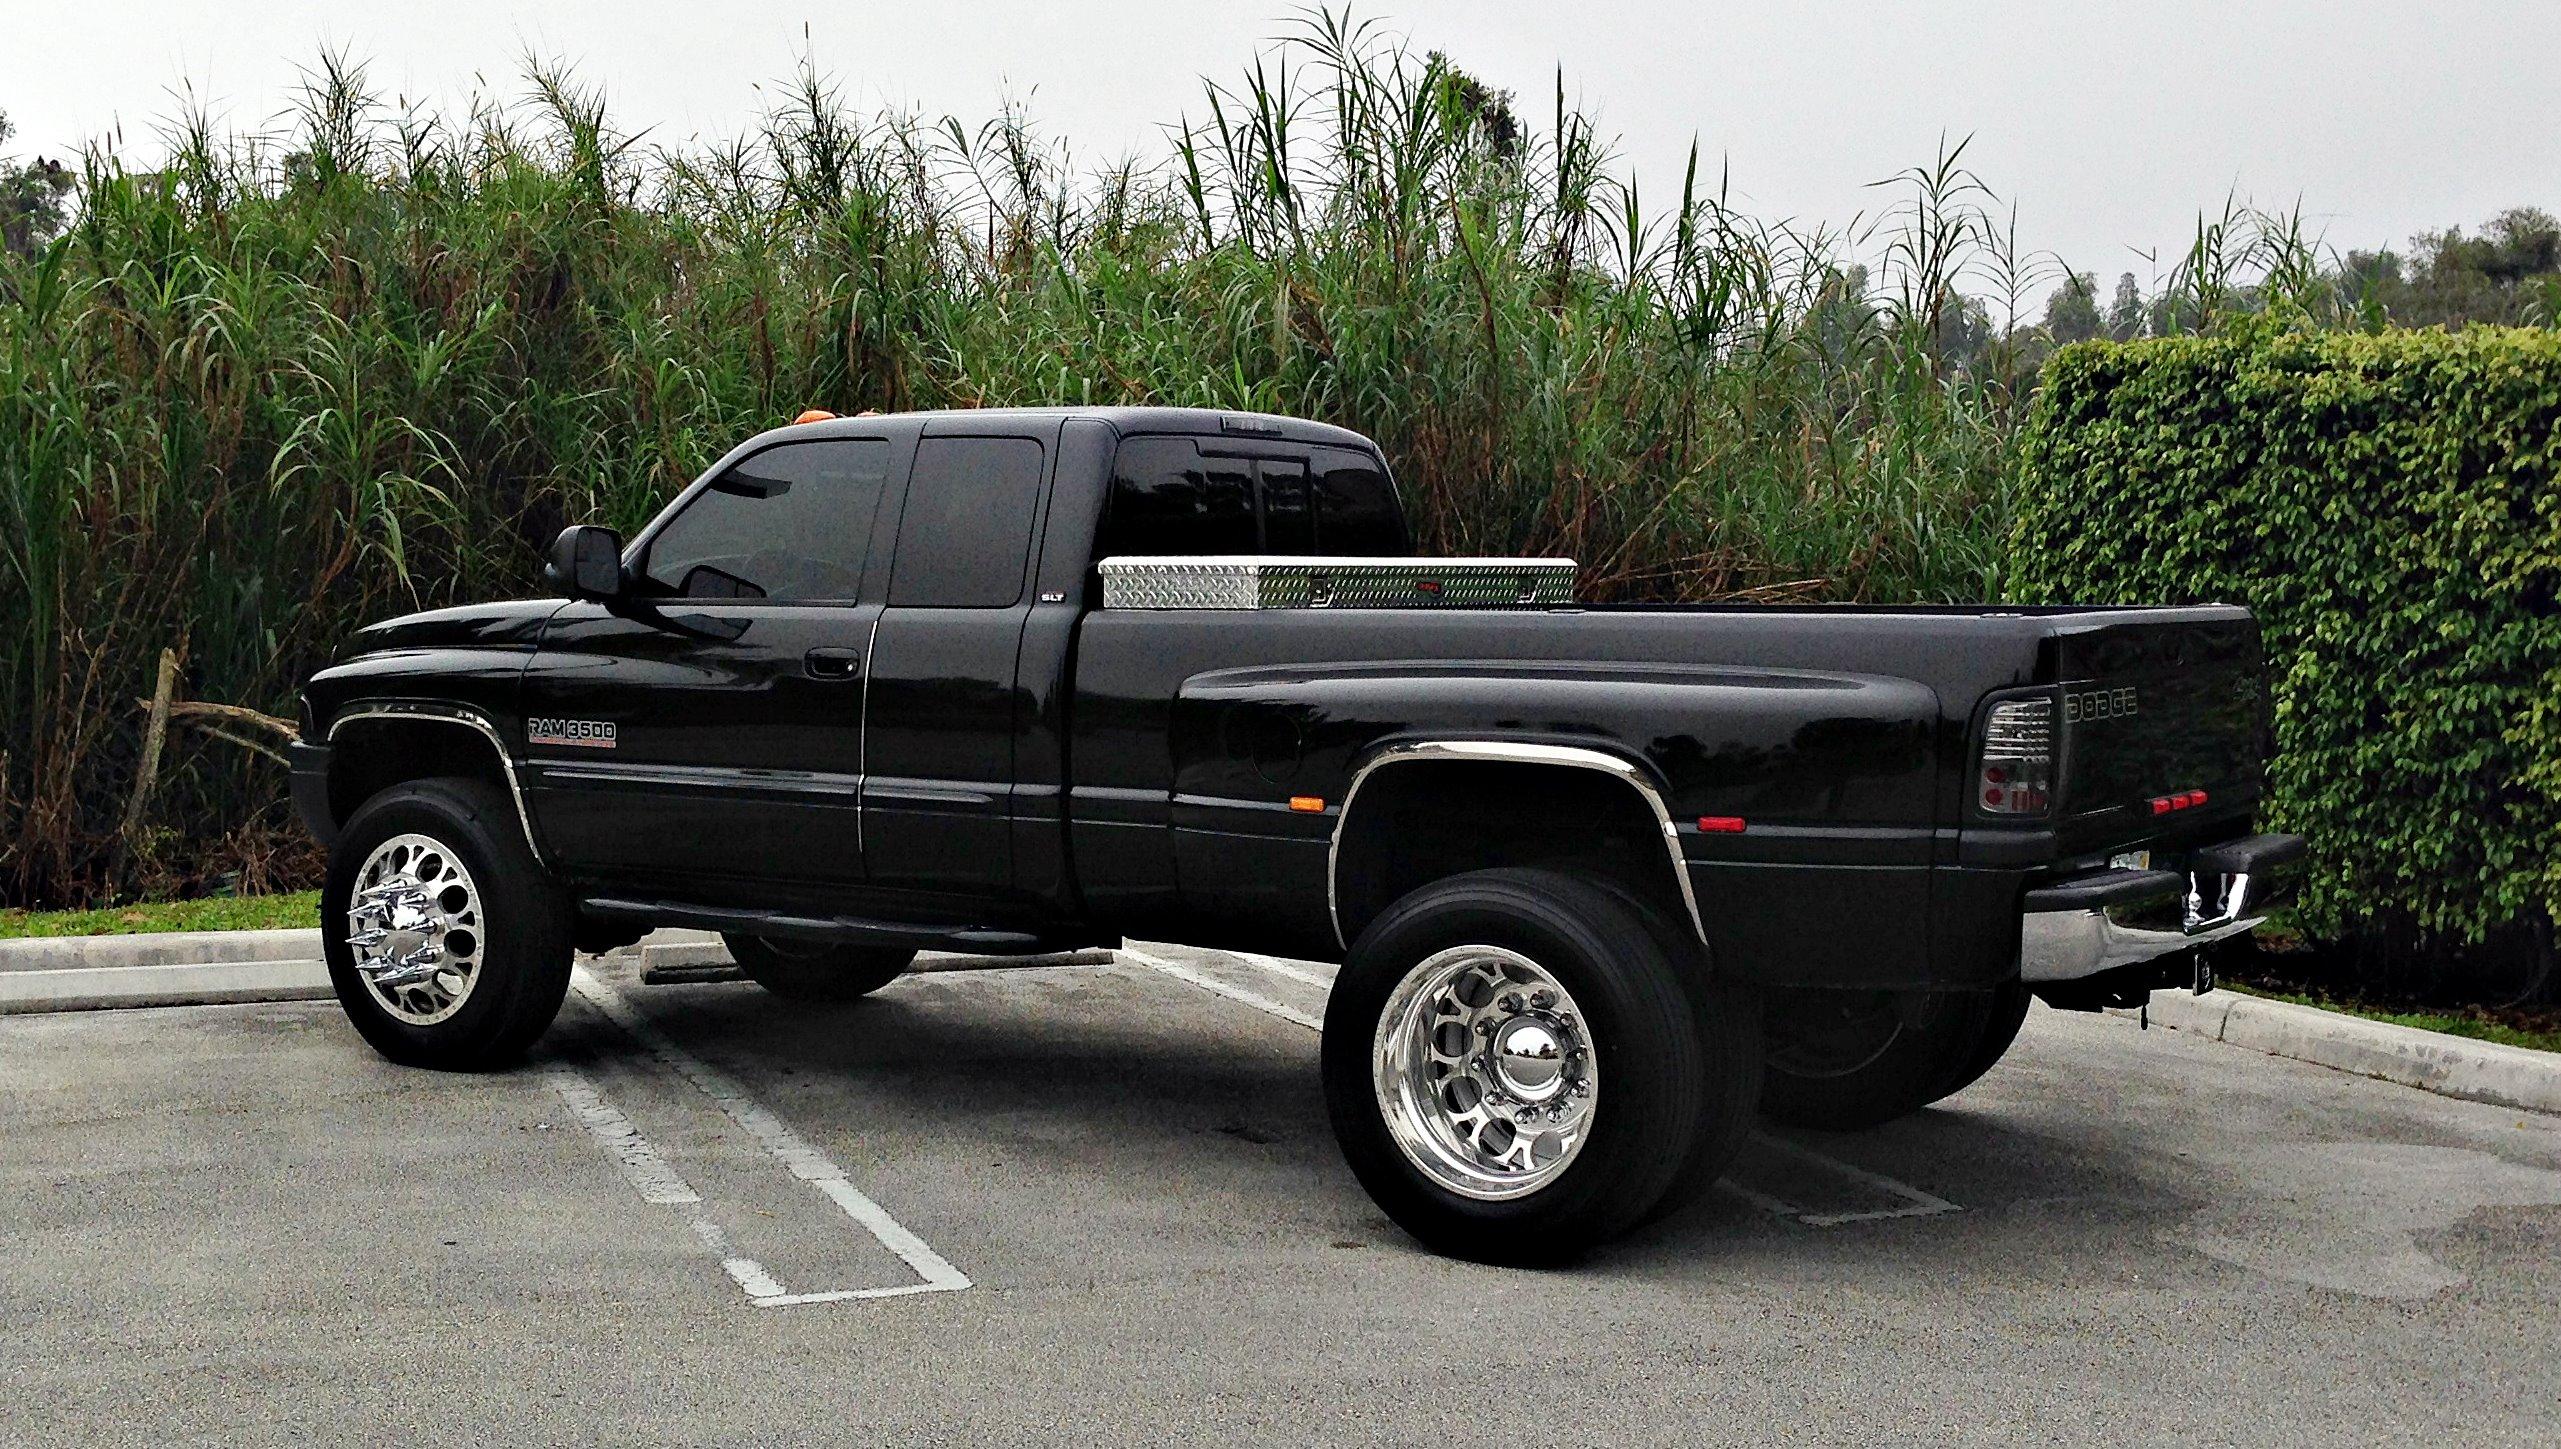 2002 dodge ram pickup 3500 11 dodge ram pickup 3500 11